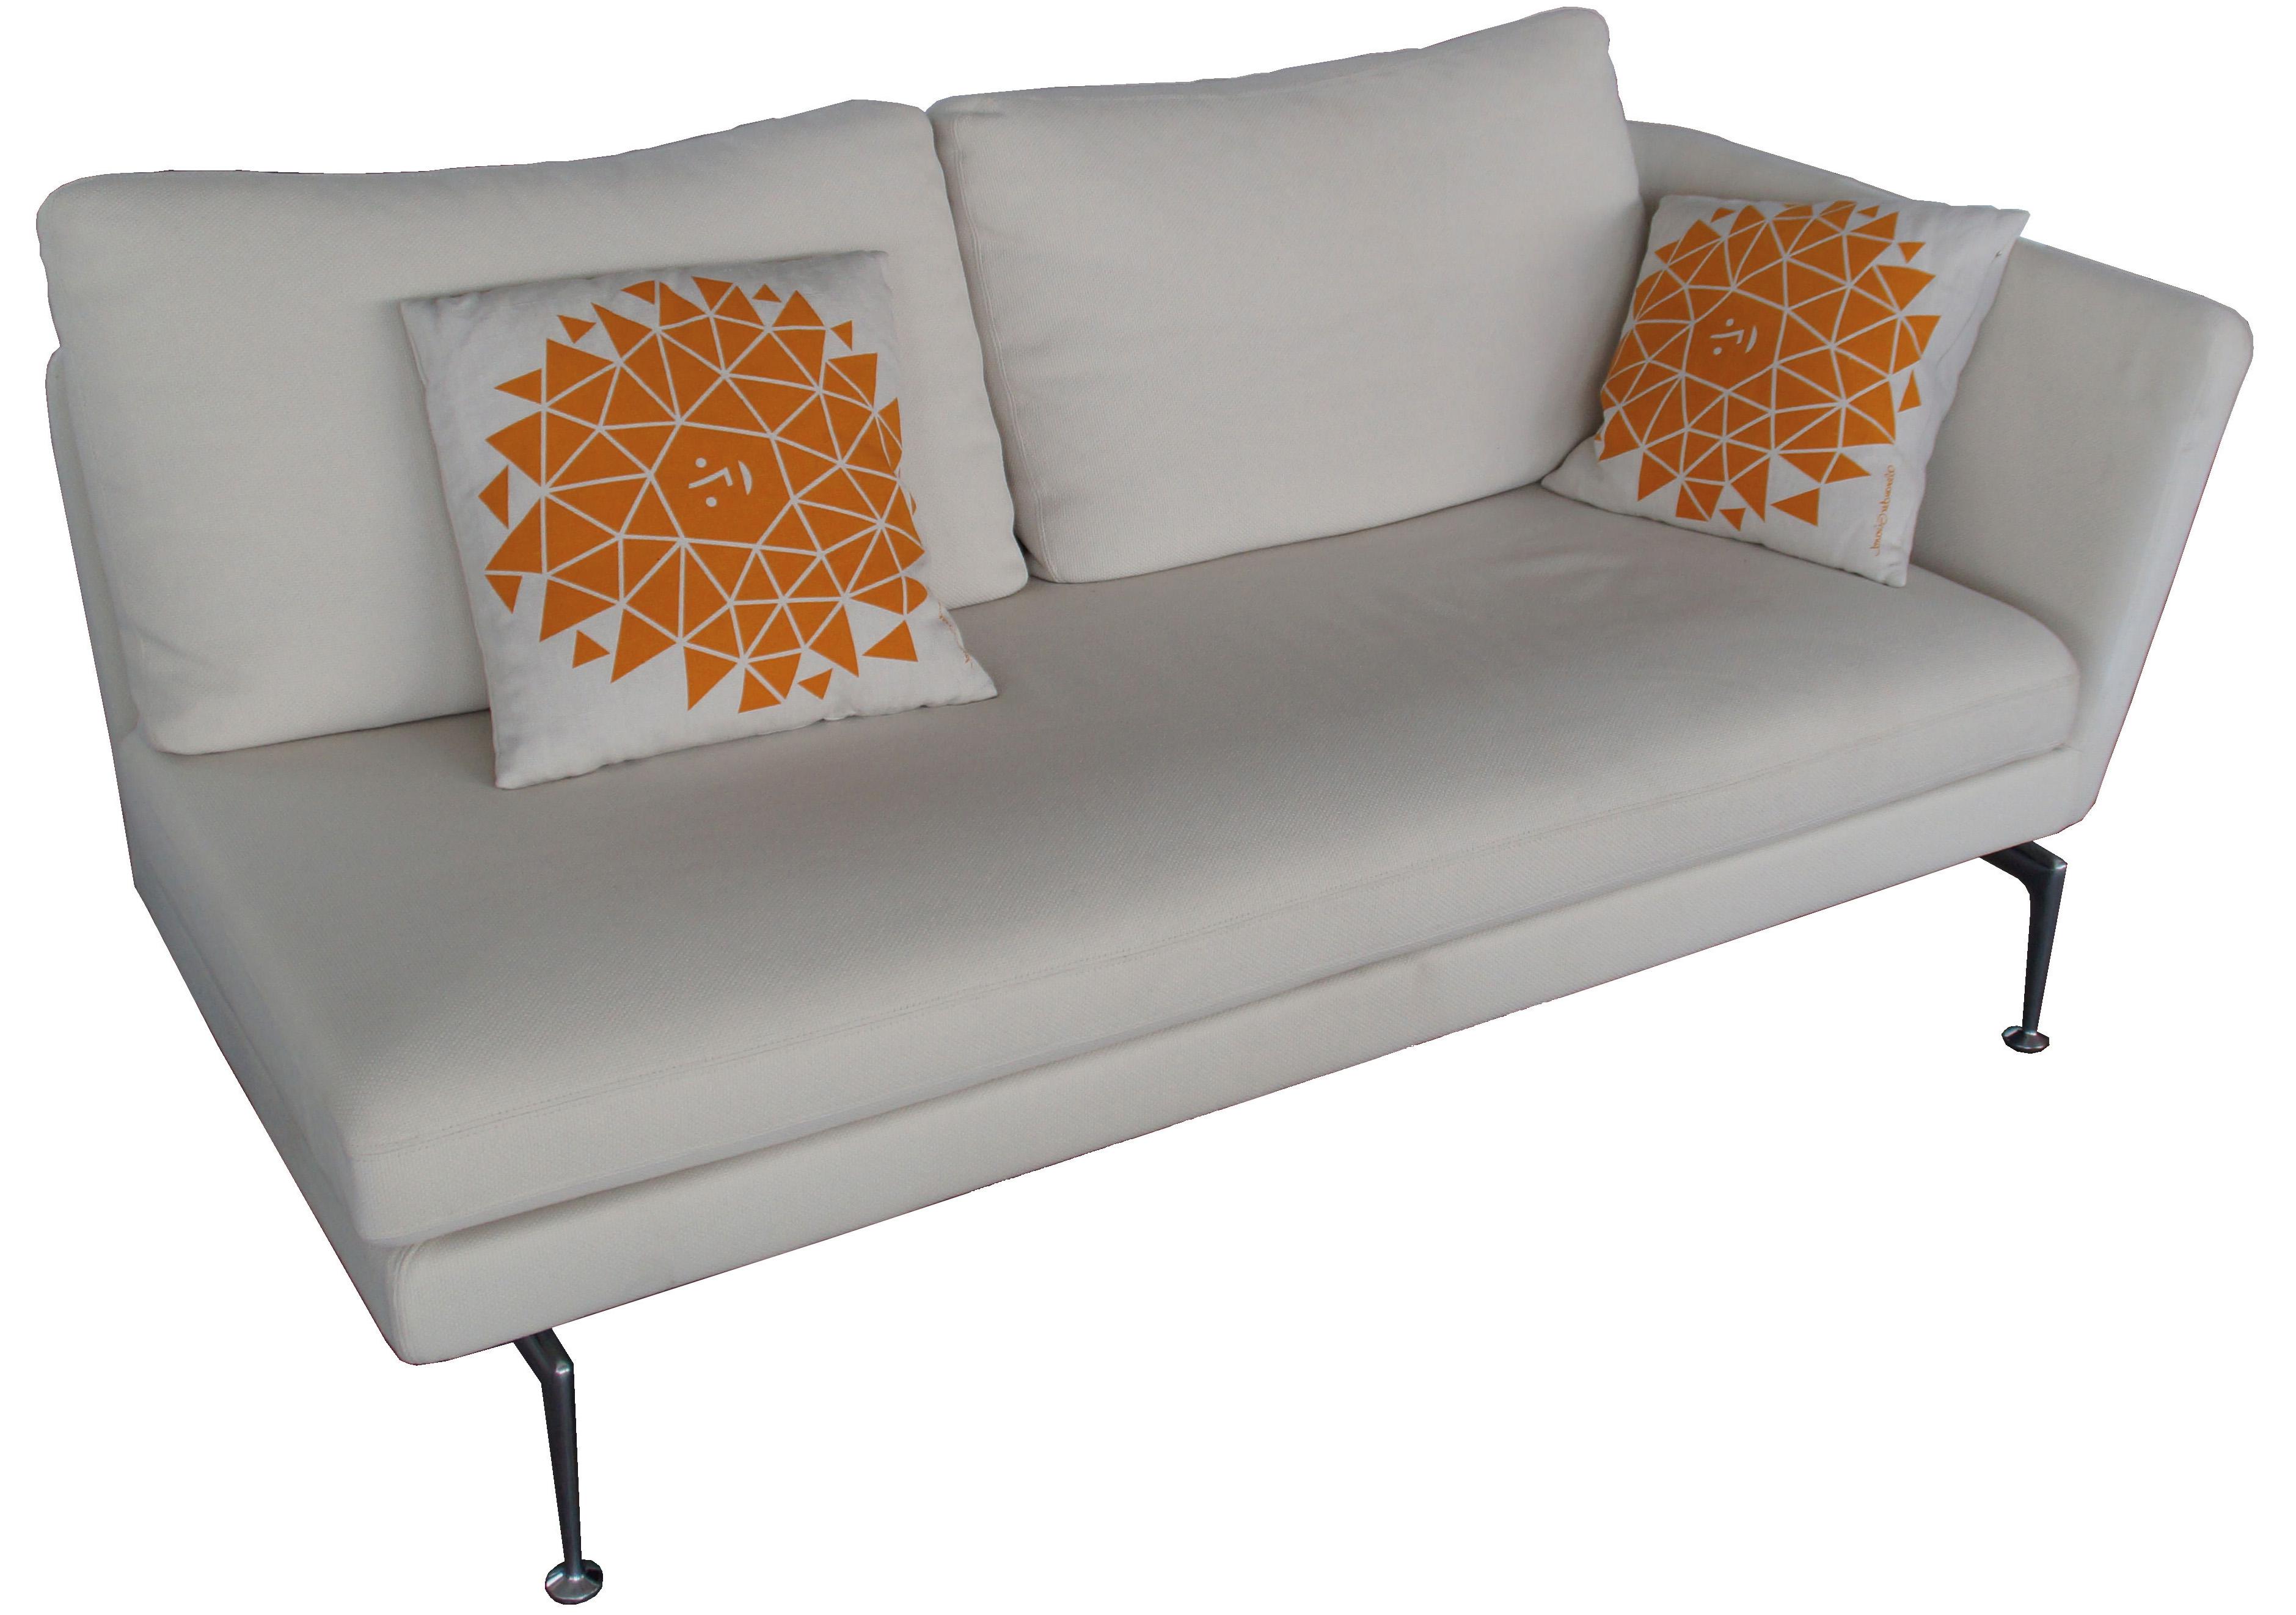 SUITA 2-Sitzer Sofa / VITRA mit Armlehne rechts